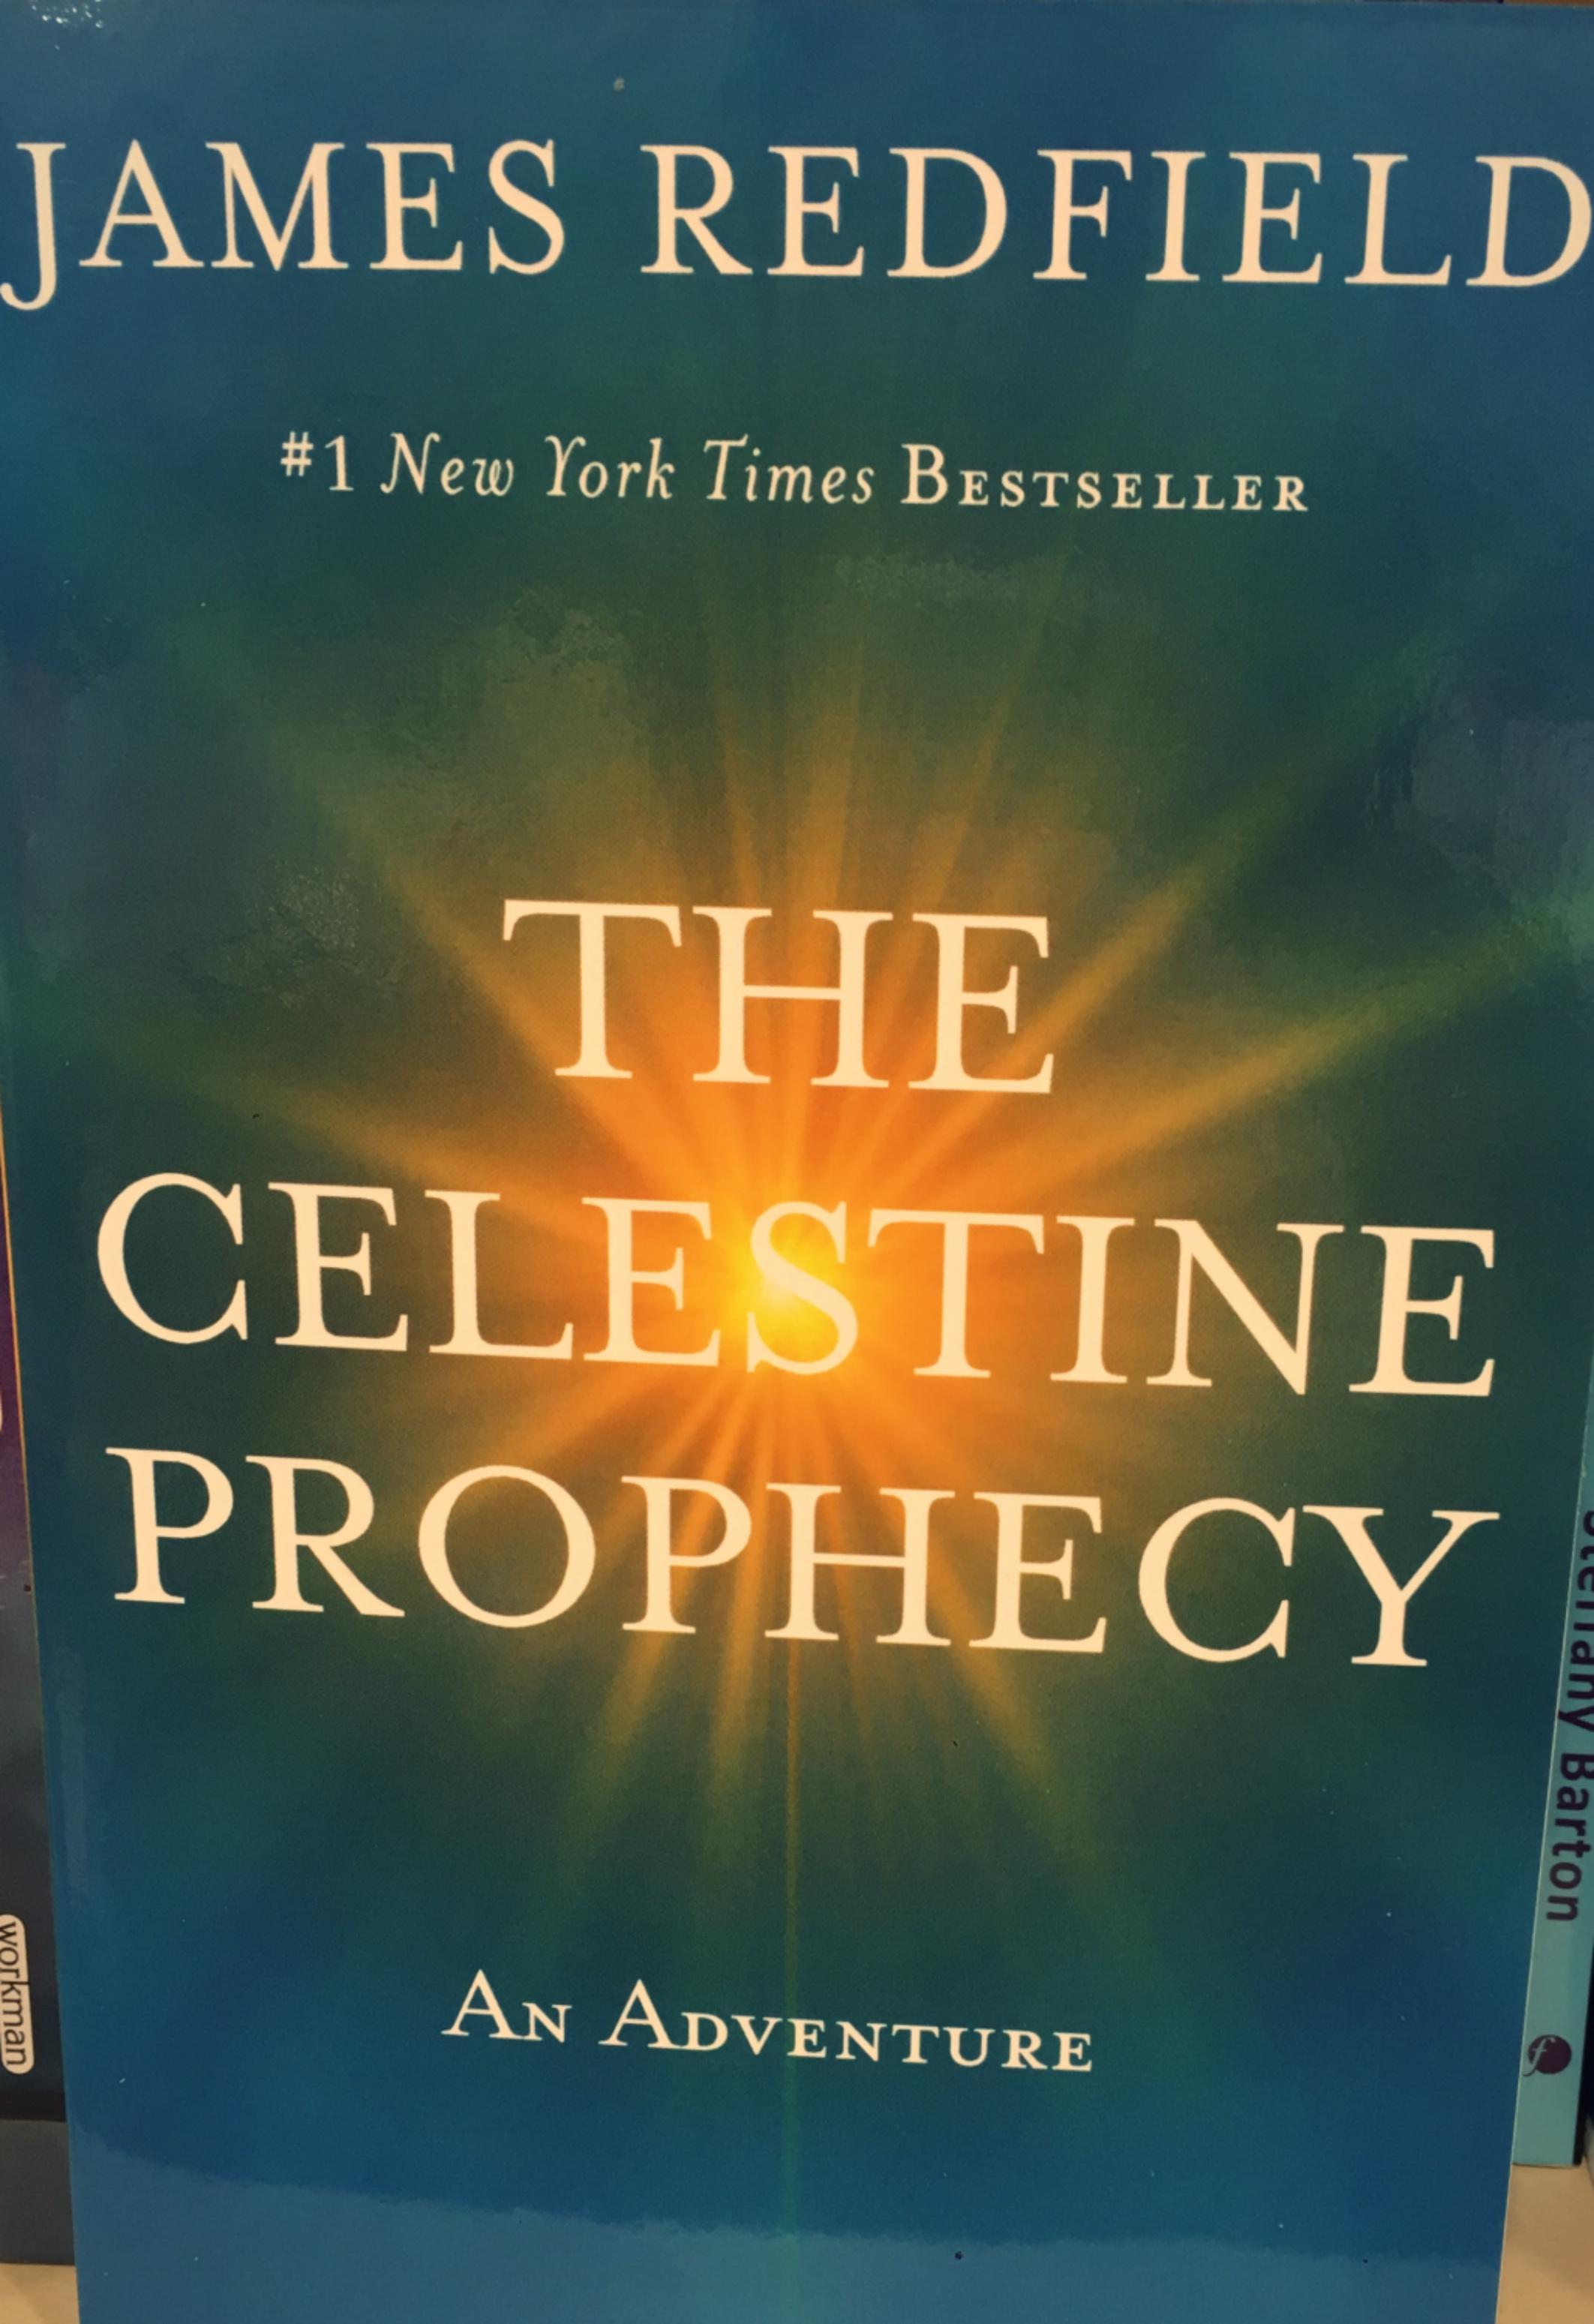 The Celestine Prophecy BOOK.jpg